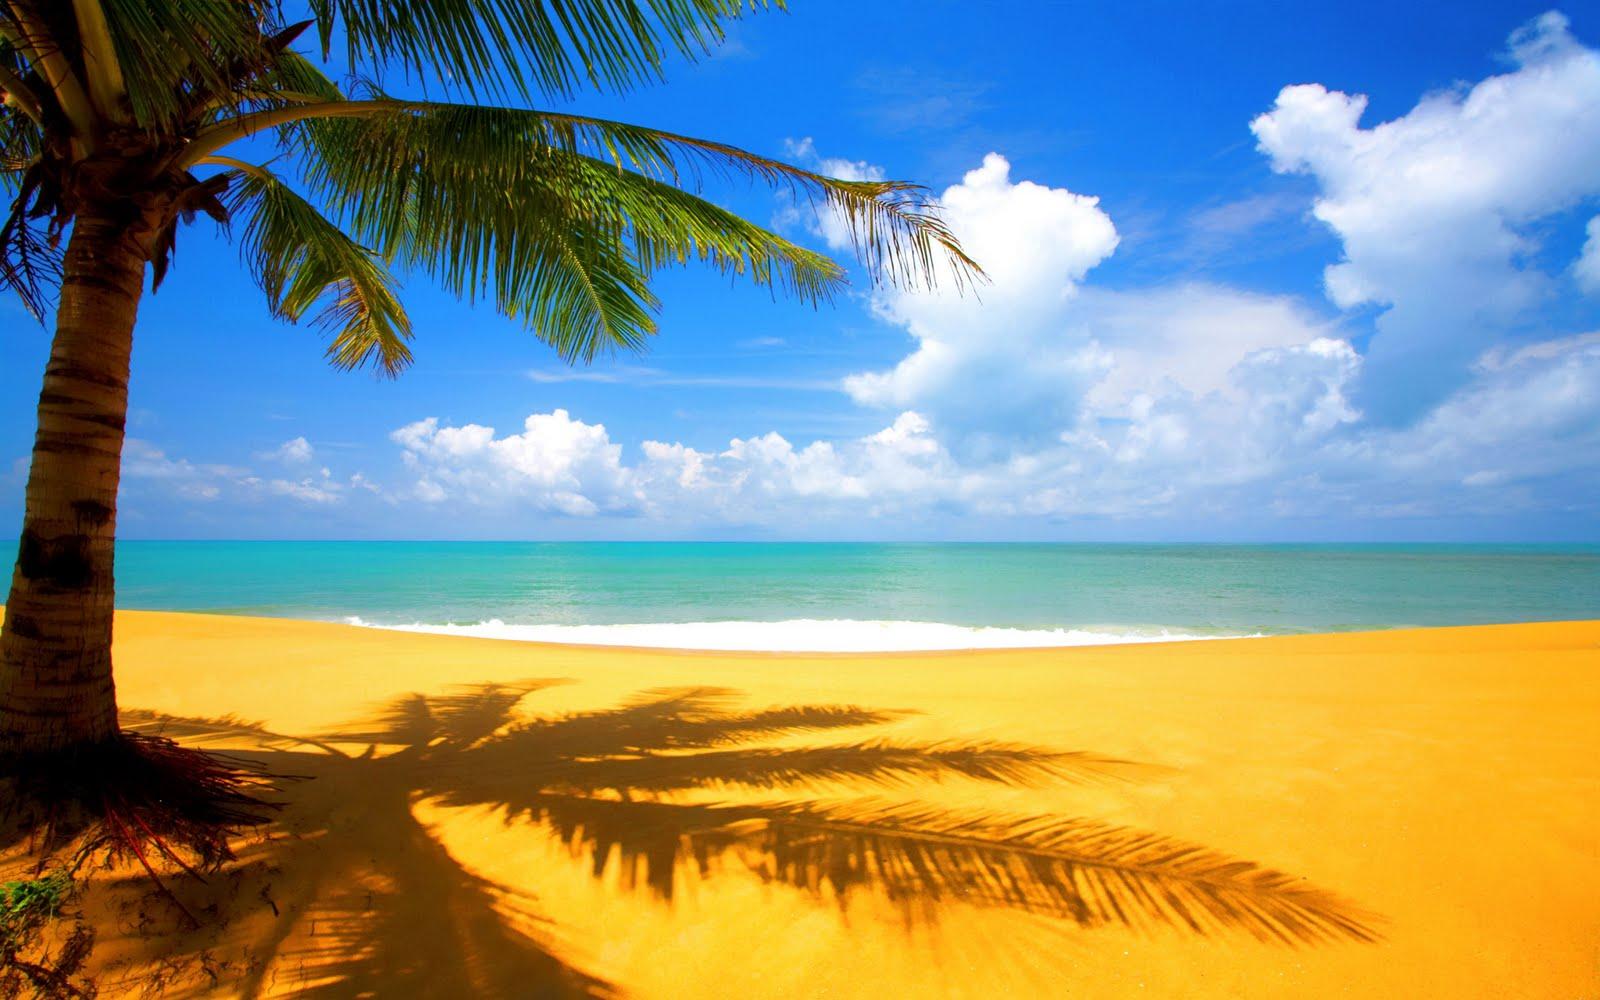 http://1.bp.blogspot.com/_euRtaEmNtFo/TFaqWhdSuUI/AAAAAAAAA78/uXoDXbj_G90/s1600/at-the-beach-hd-wallpaper.jpeg